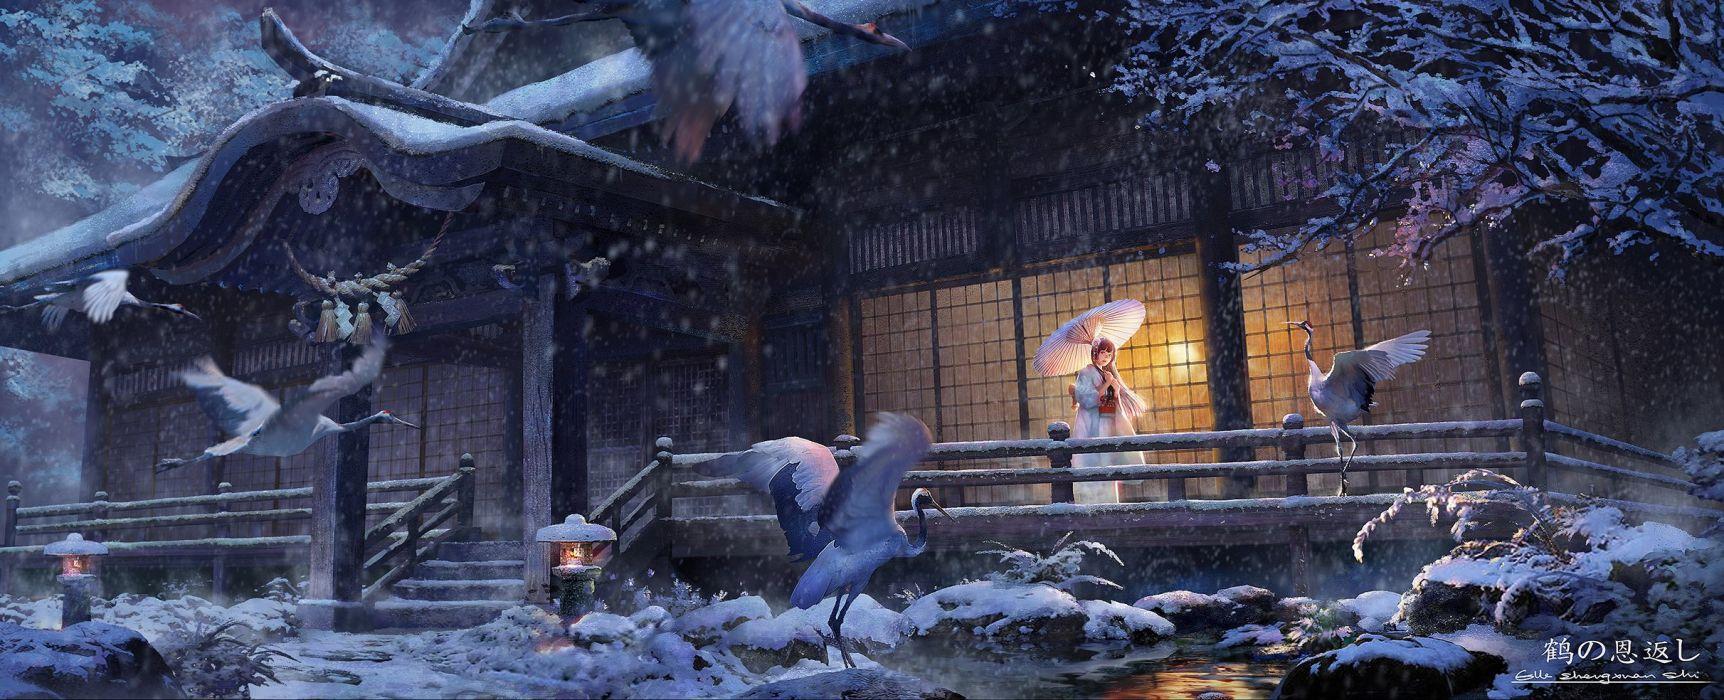 animal bird dualscreen japanese clothes kimono lost elle rope shrine signed snow tree tsuru no ongaeshi umbrella water winter wallpaper